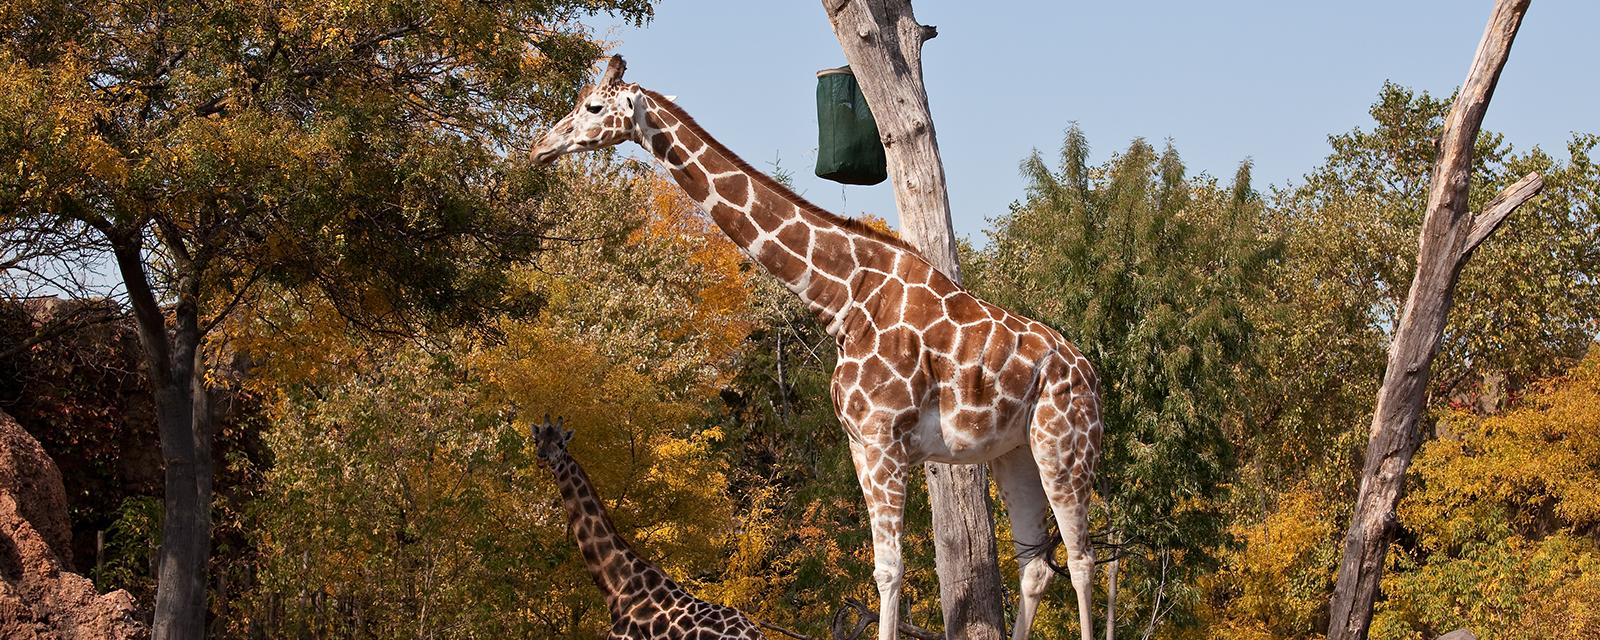 Zootopia – The World of Sustainable Zoos